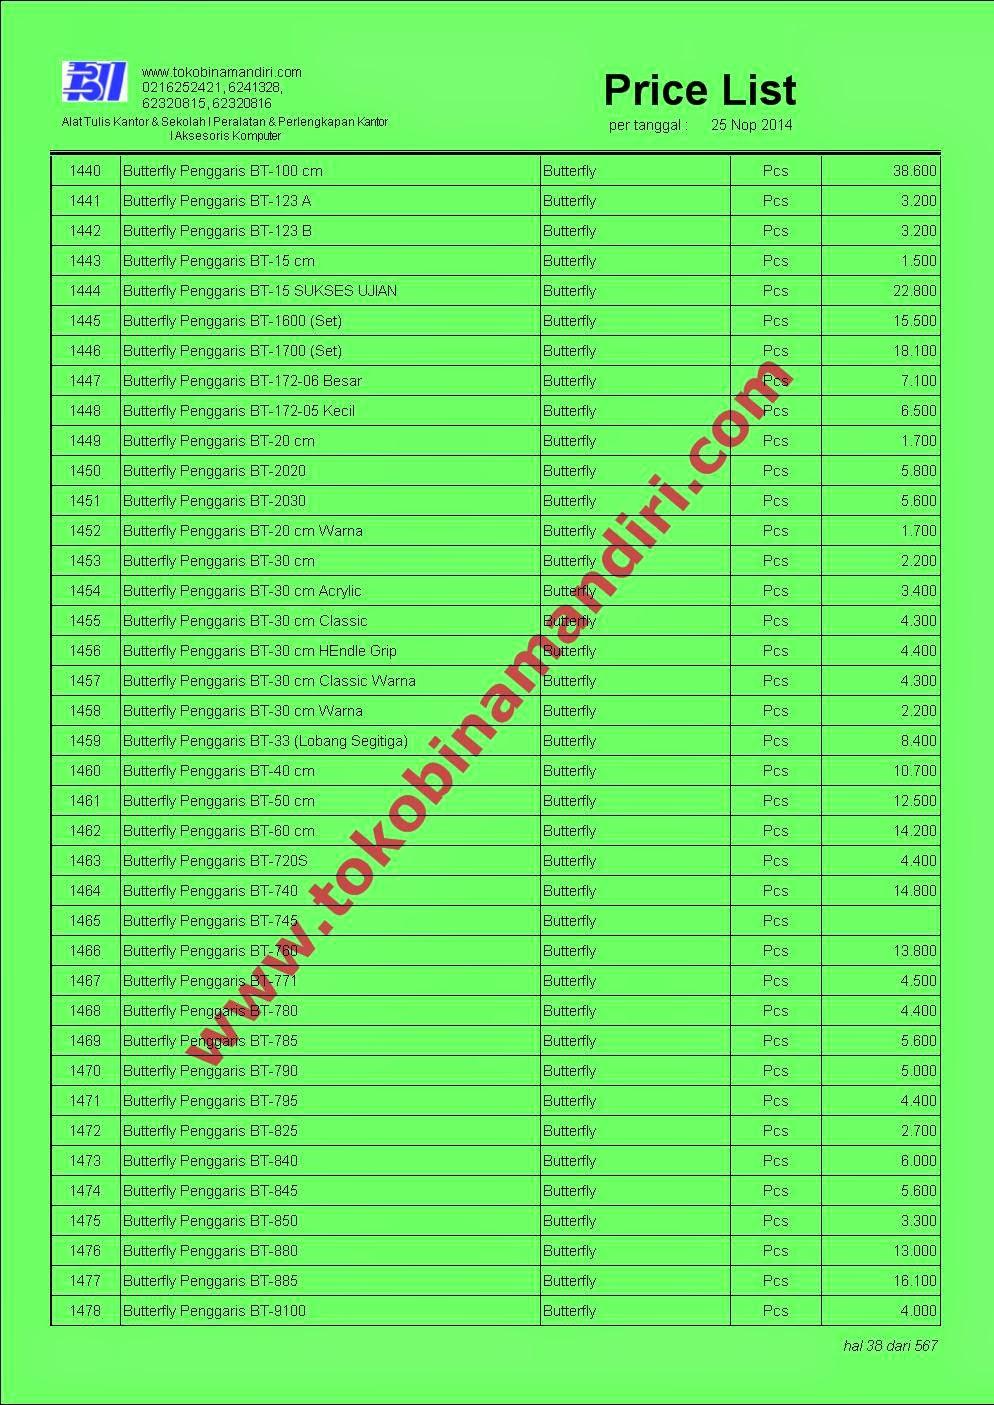 Daftar Harga Alat Tulis ATK038 - Penggaris Butterfly